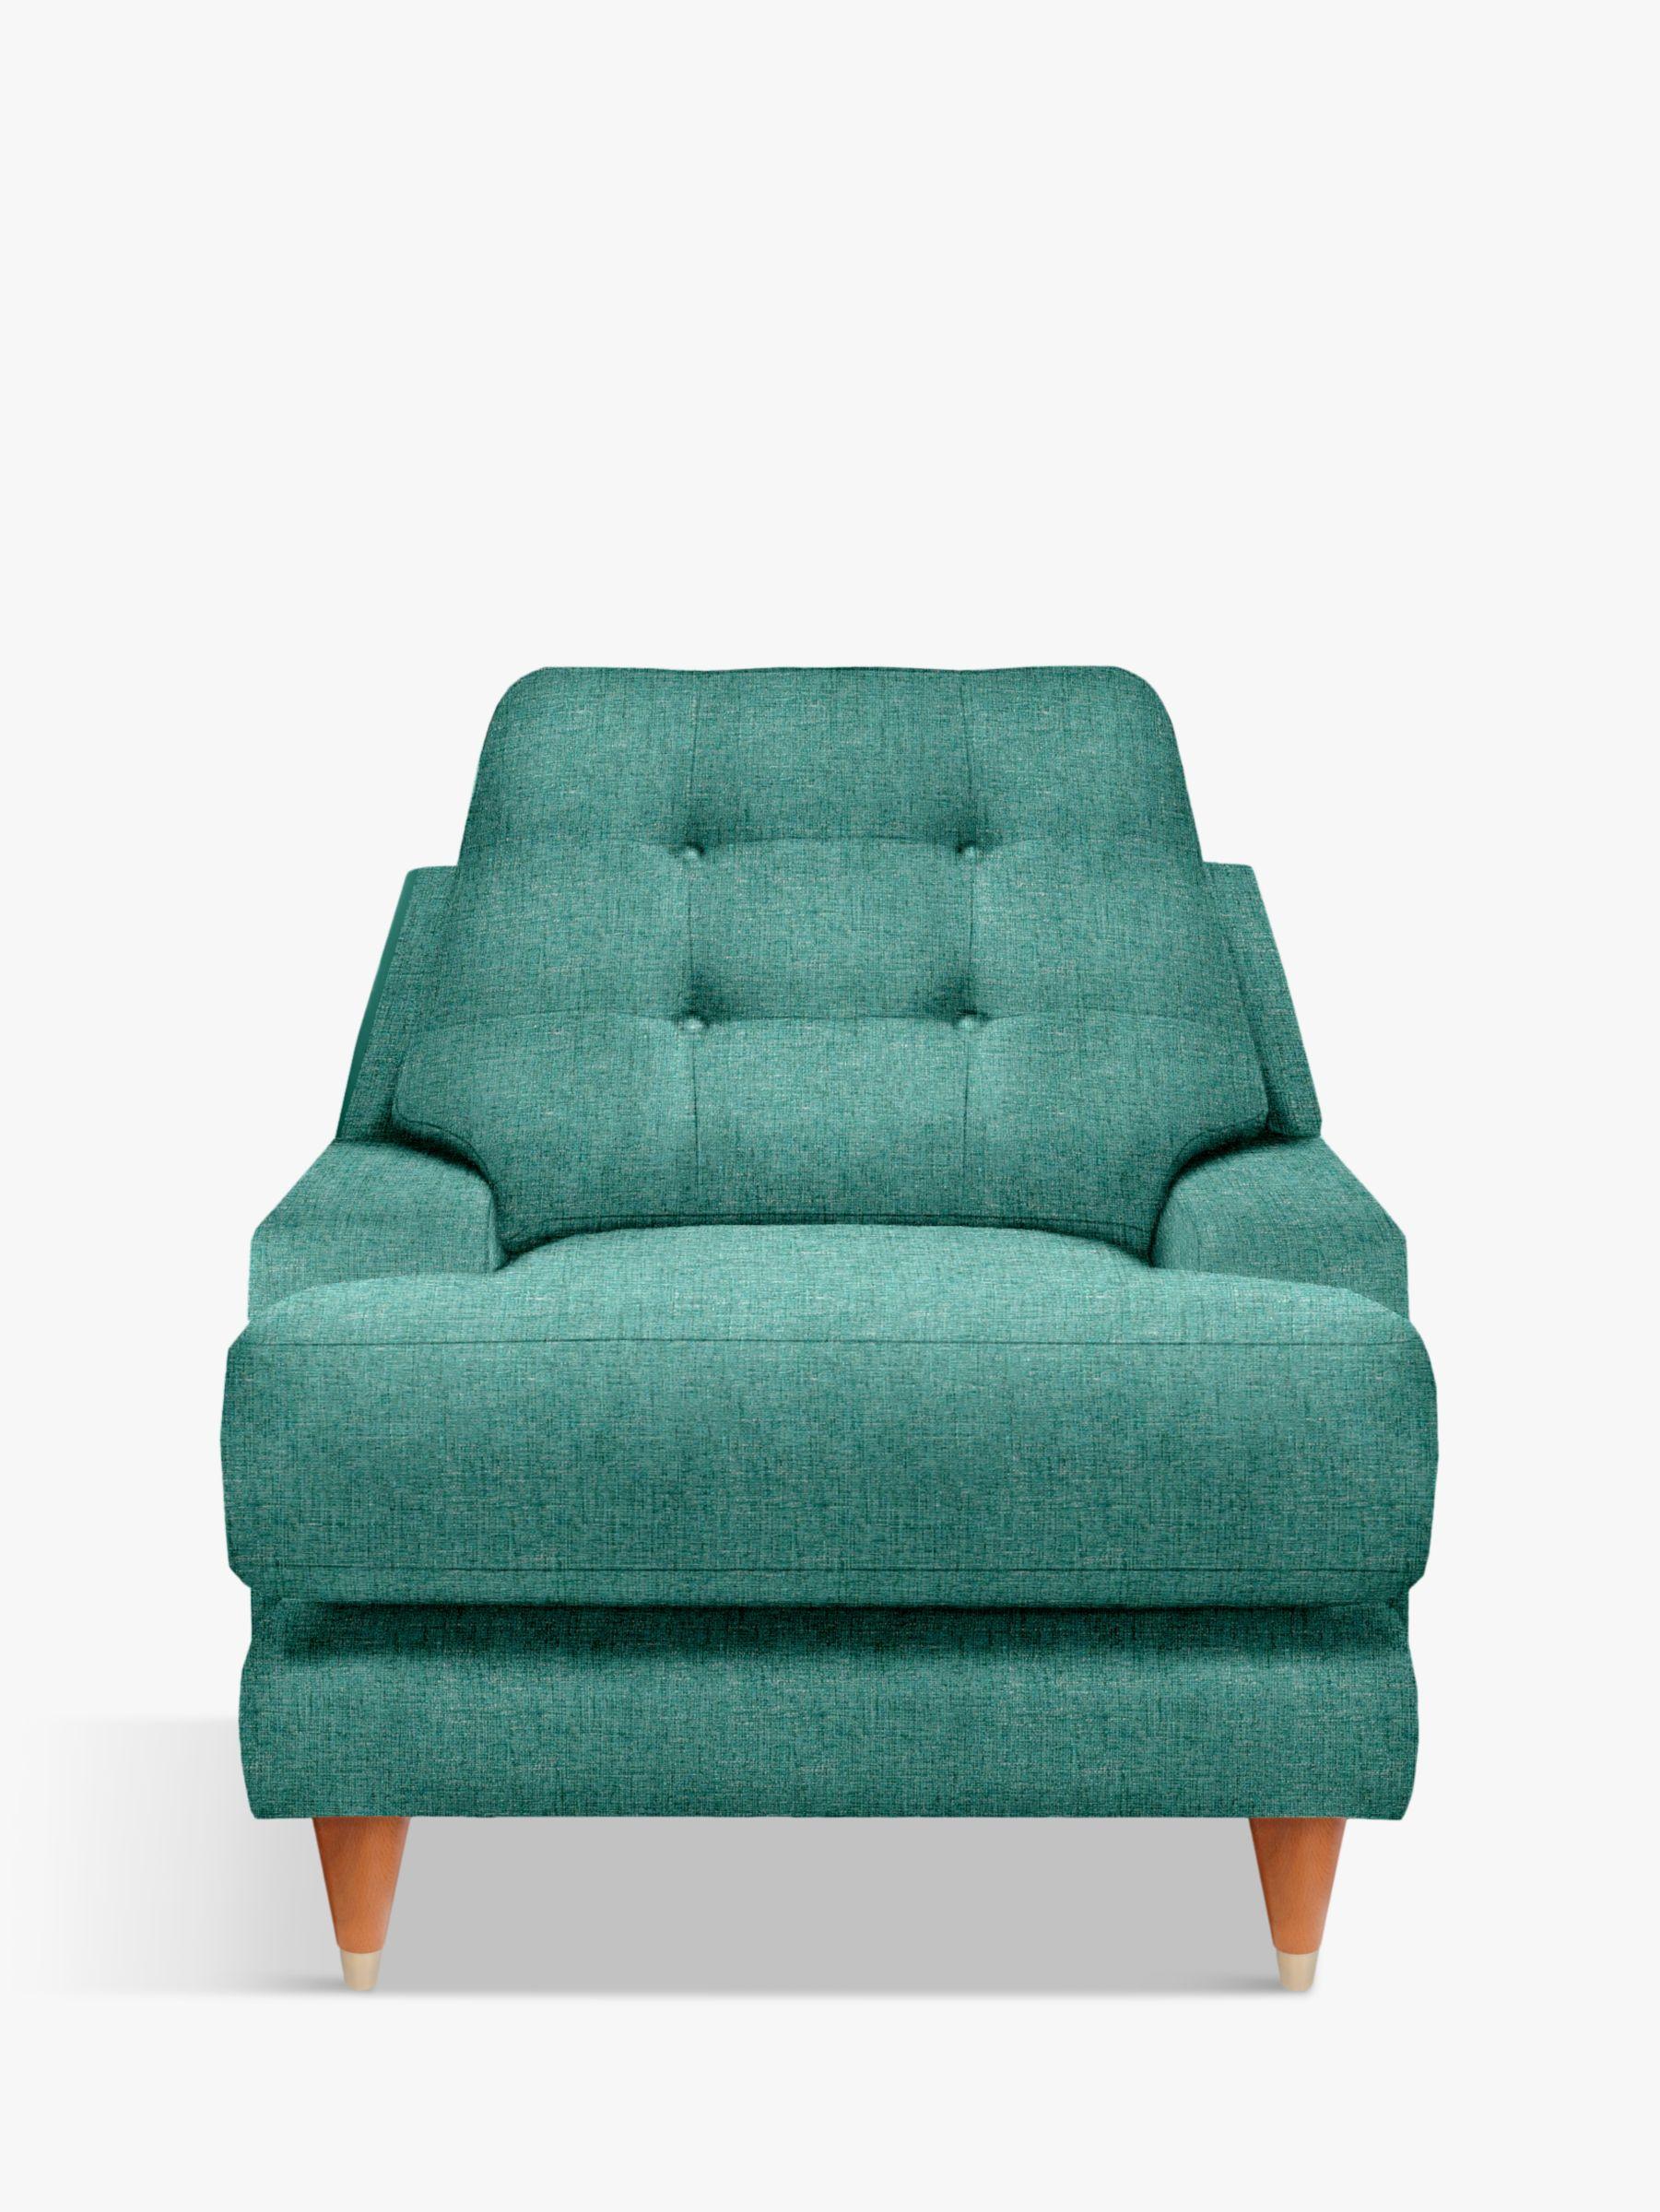 G Plan Vintage G Plan Vintage The Fifty Seven Armchair, Sorren Teal